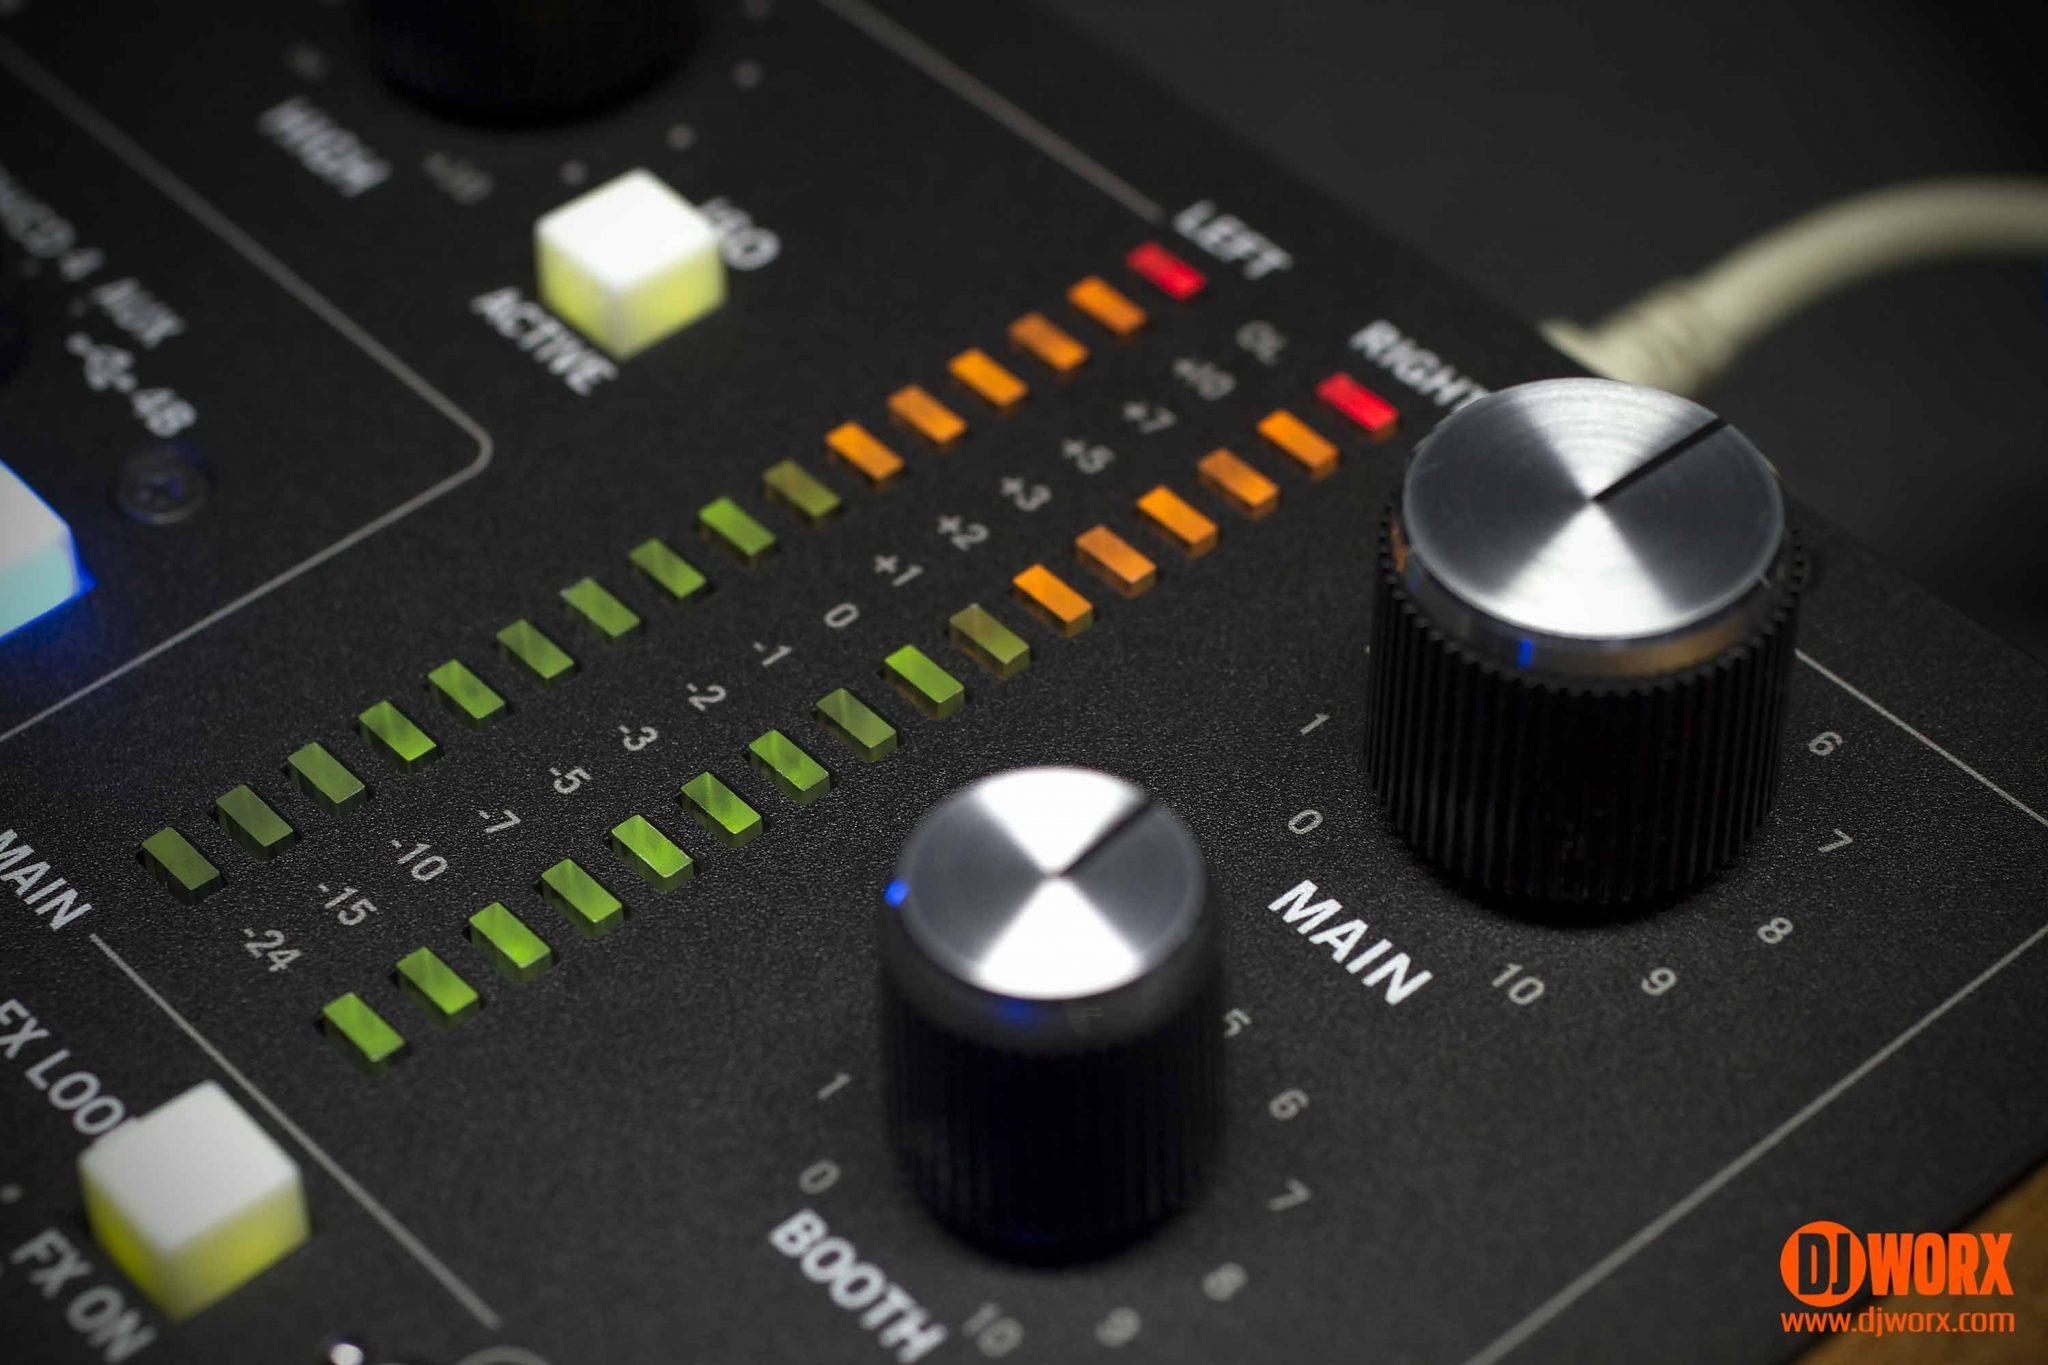 Rane MP2015 rotary DJ mixer review (27)